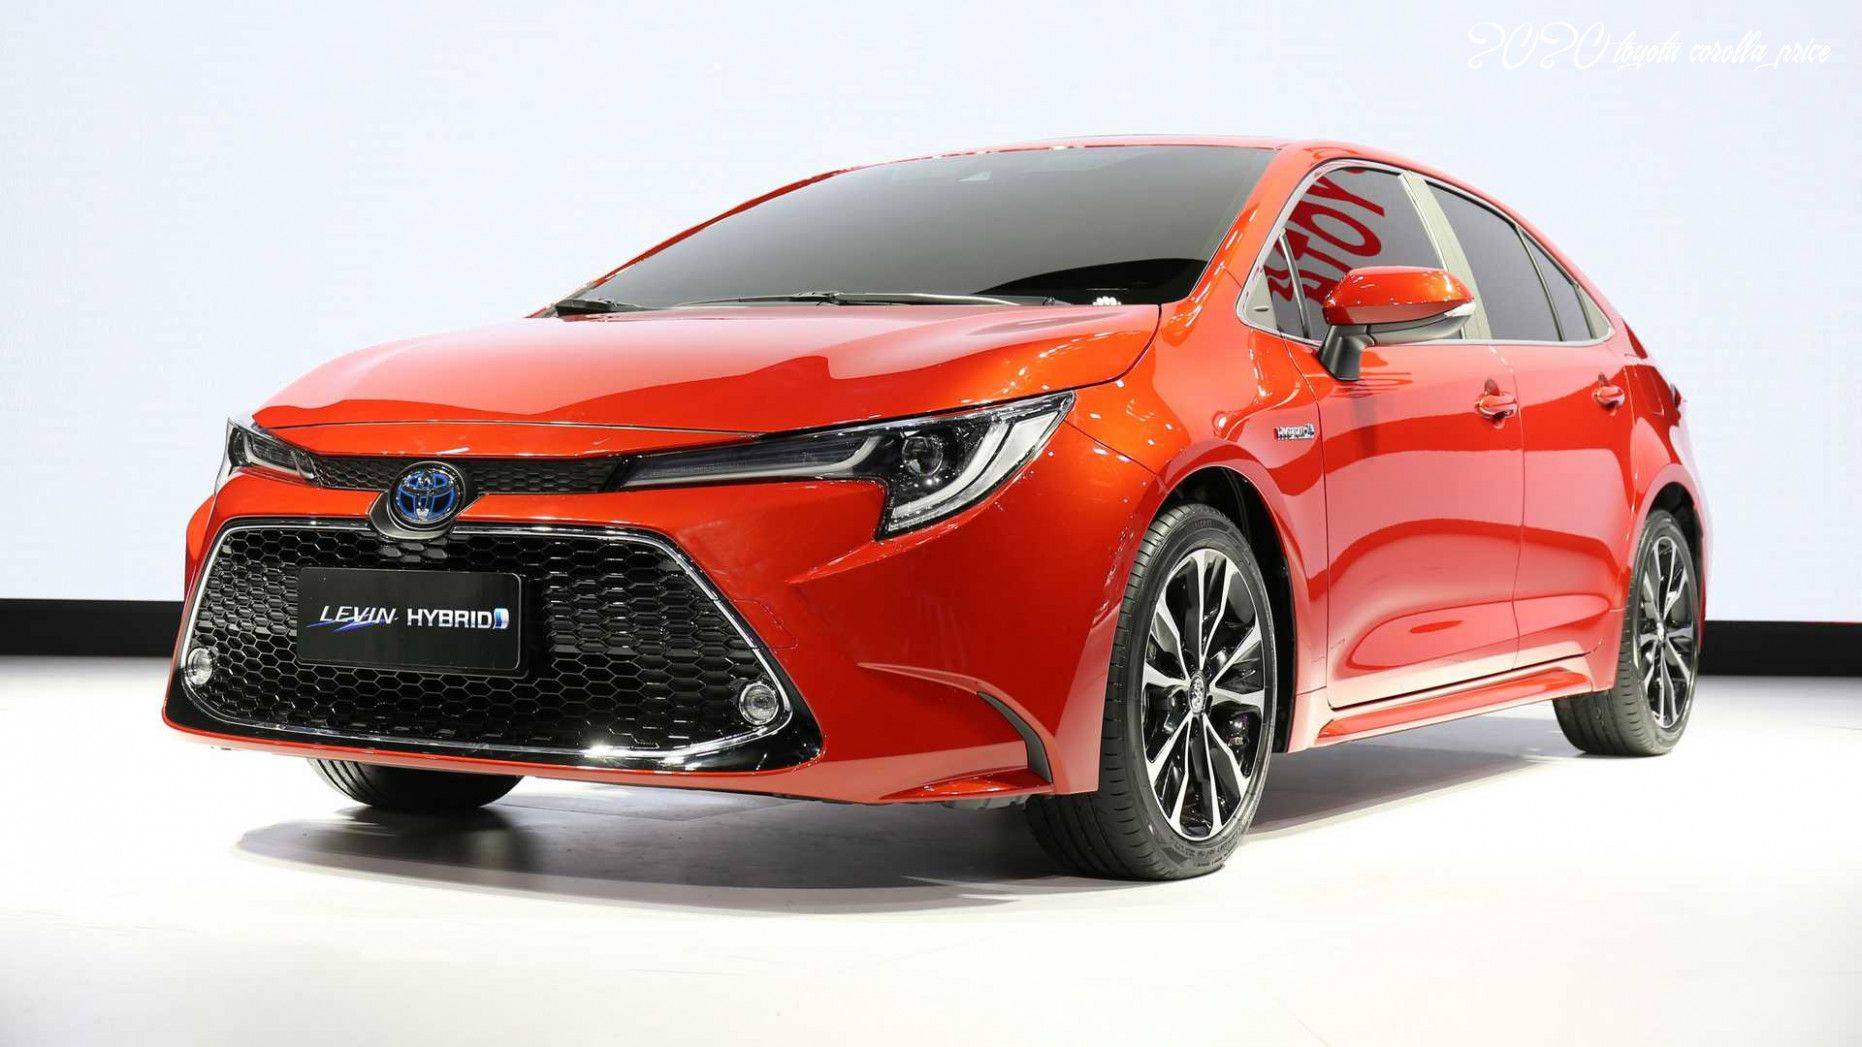 2020 Toyota Corolla Price In 2020 Toyota Corolla Toyota Corolla Le Toyota Corolla Price